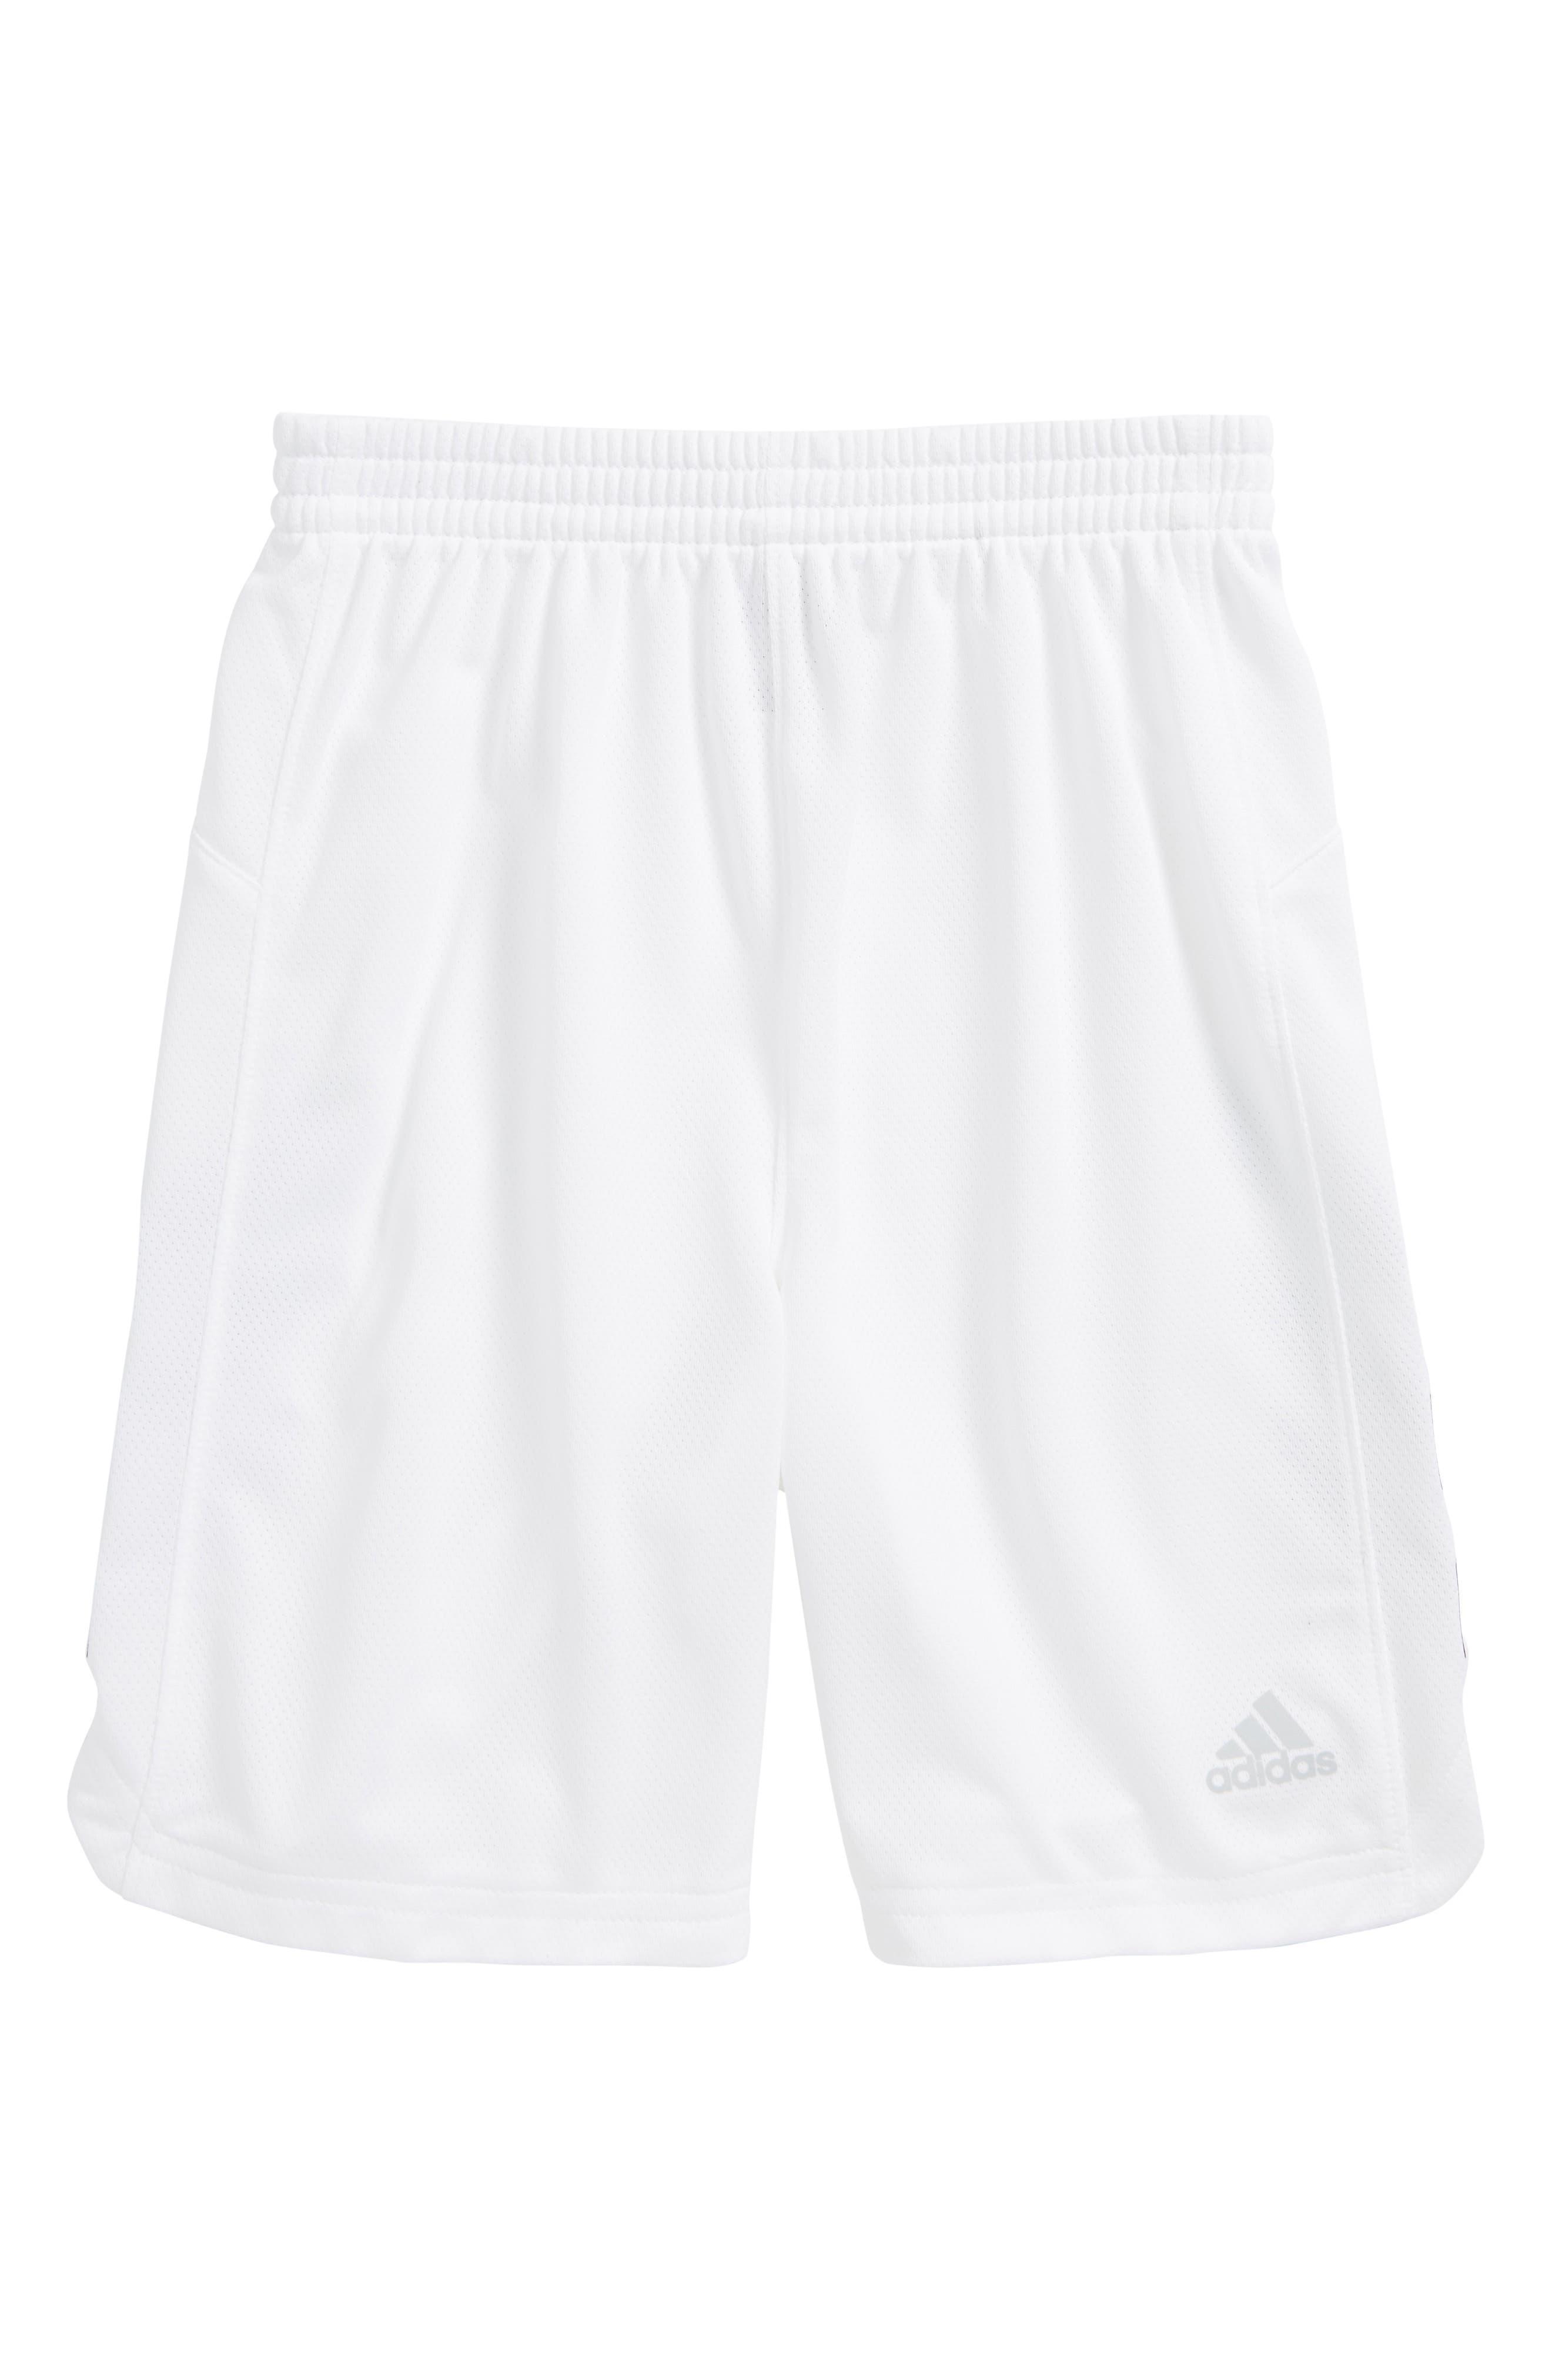 Climacool<sup>®</sup> Sport Shorts,                             Main thumbnail 1, color,                             White